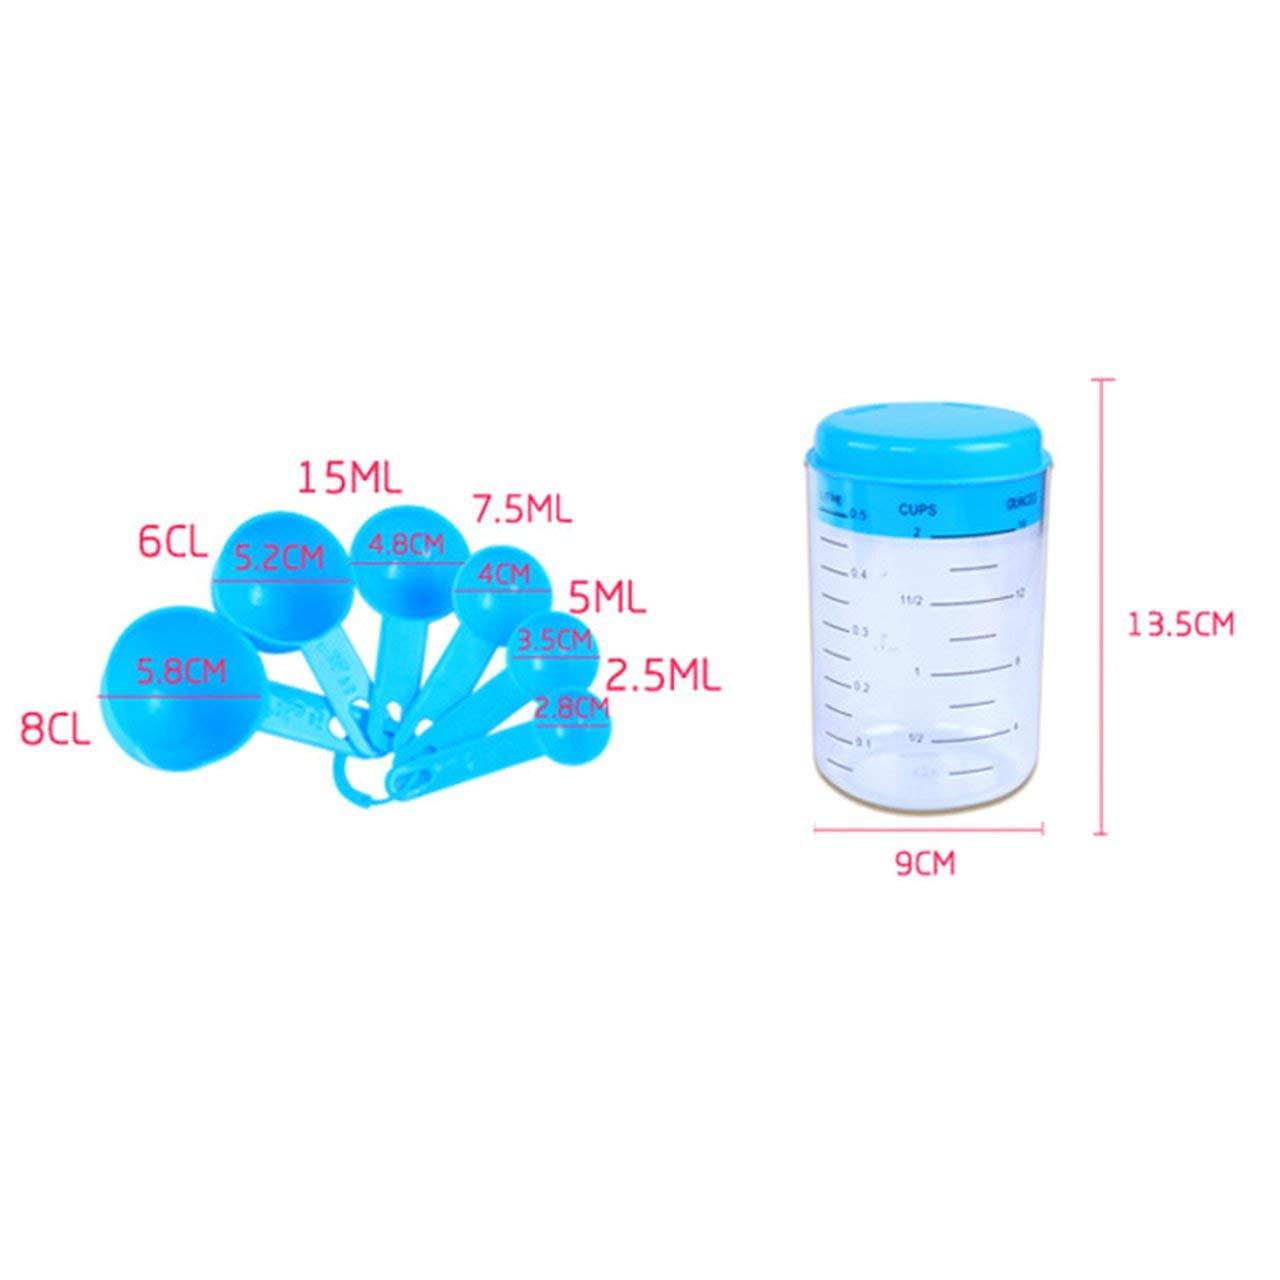 7Pcs//Set Plastic Baking Utensil Portable Kitchen Measuring Cups Sugar Cake Baking Spoon Household Measuring Scoop Blue Jasnyfall